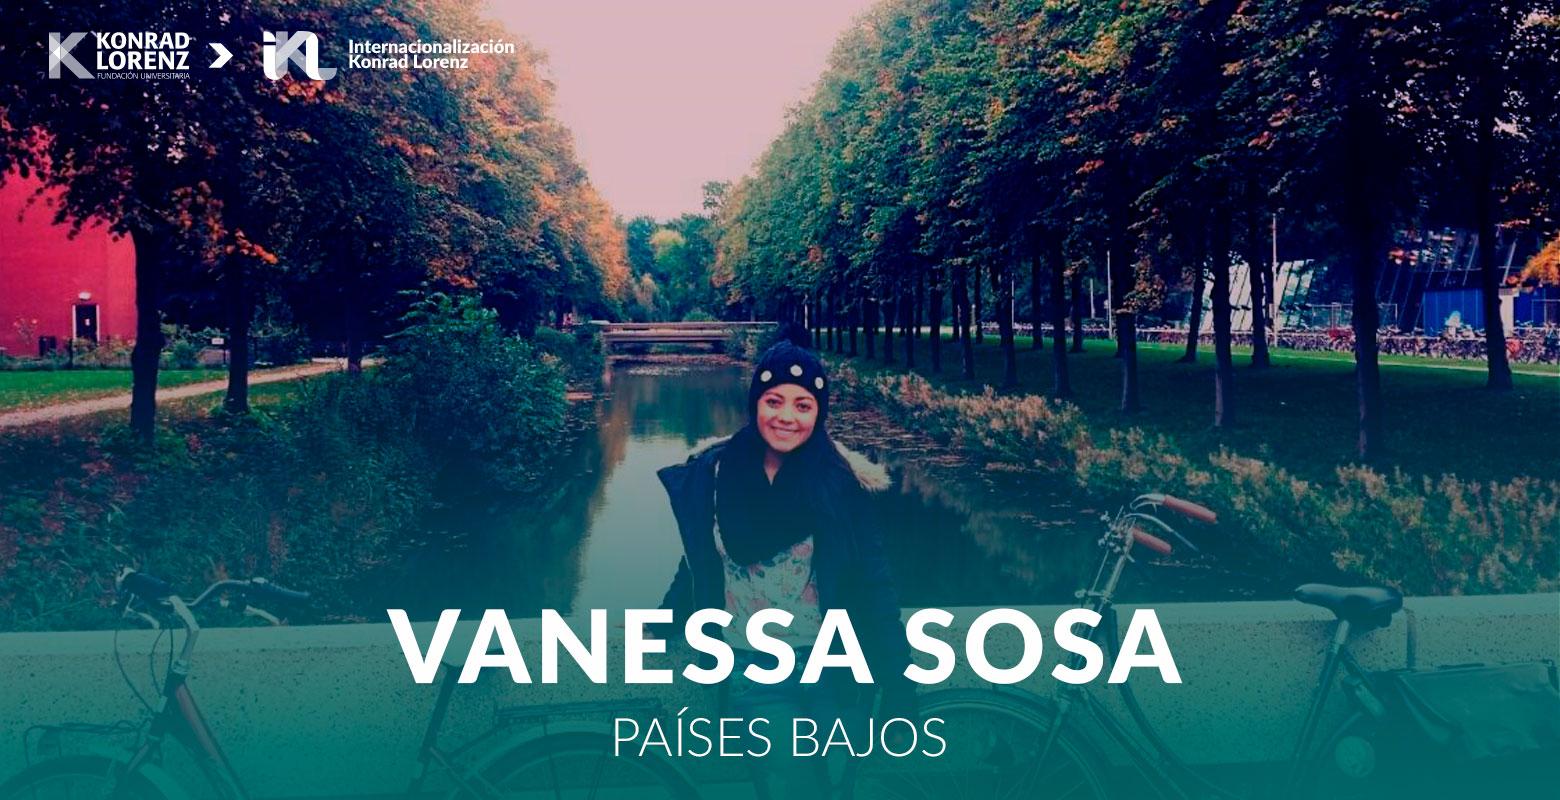 Vanessa Sosa